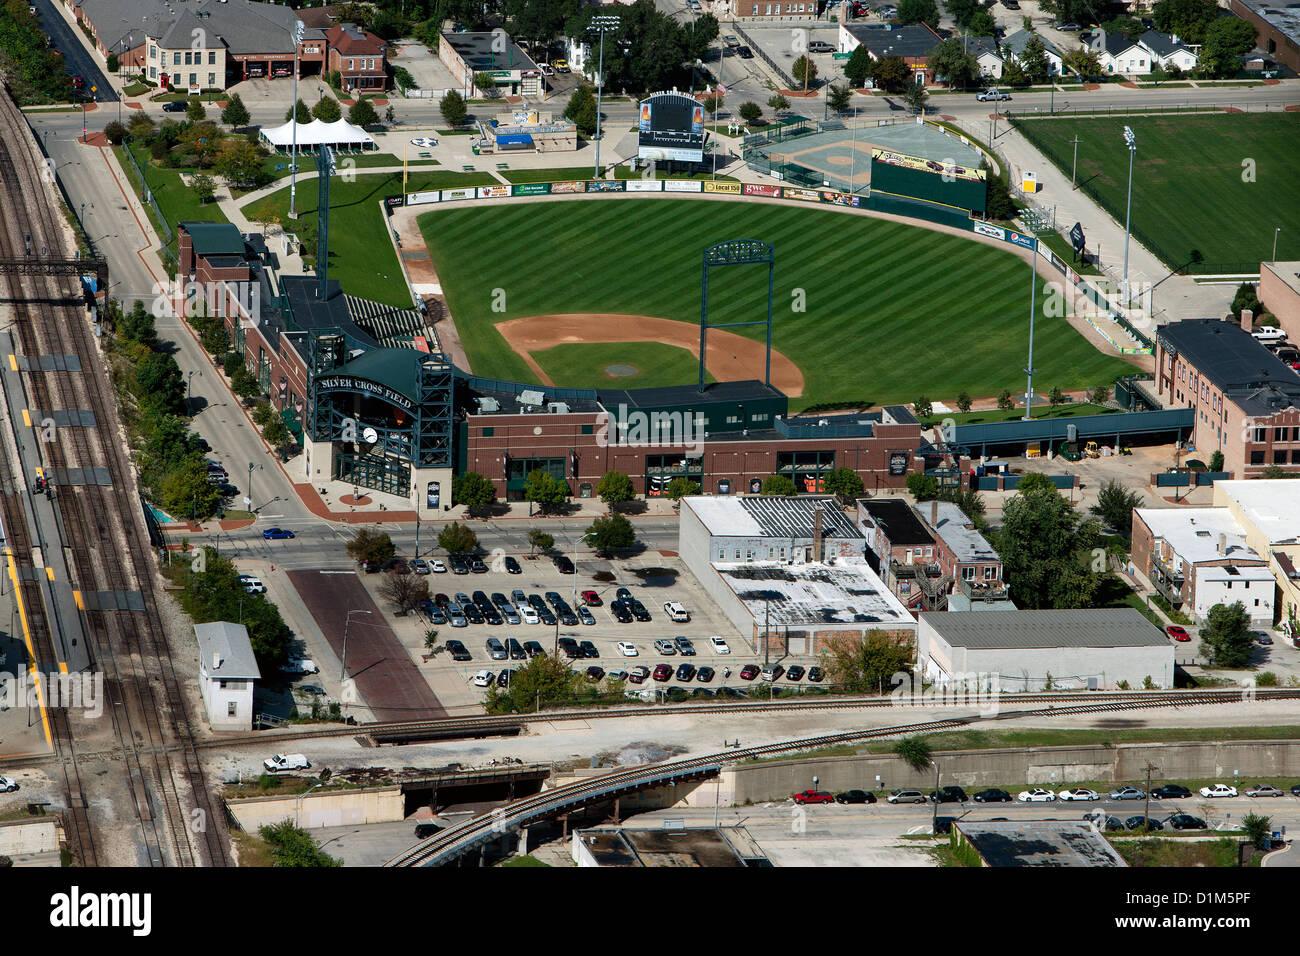 aerial photograph Silver Cross Field baseball stadium, Joliet, Illinois - Stock Image